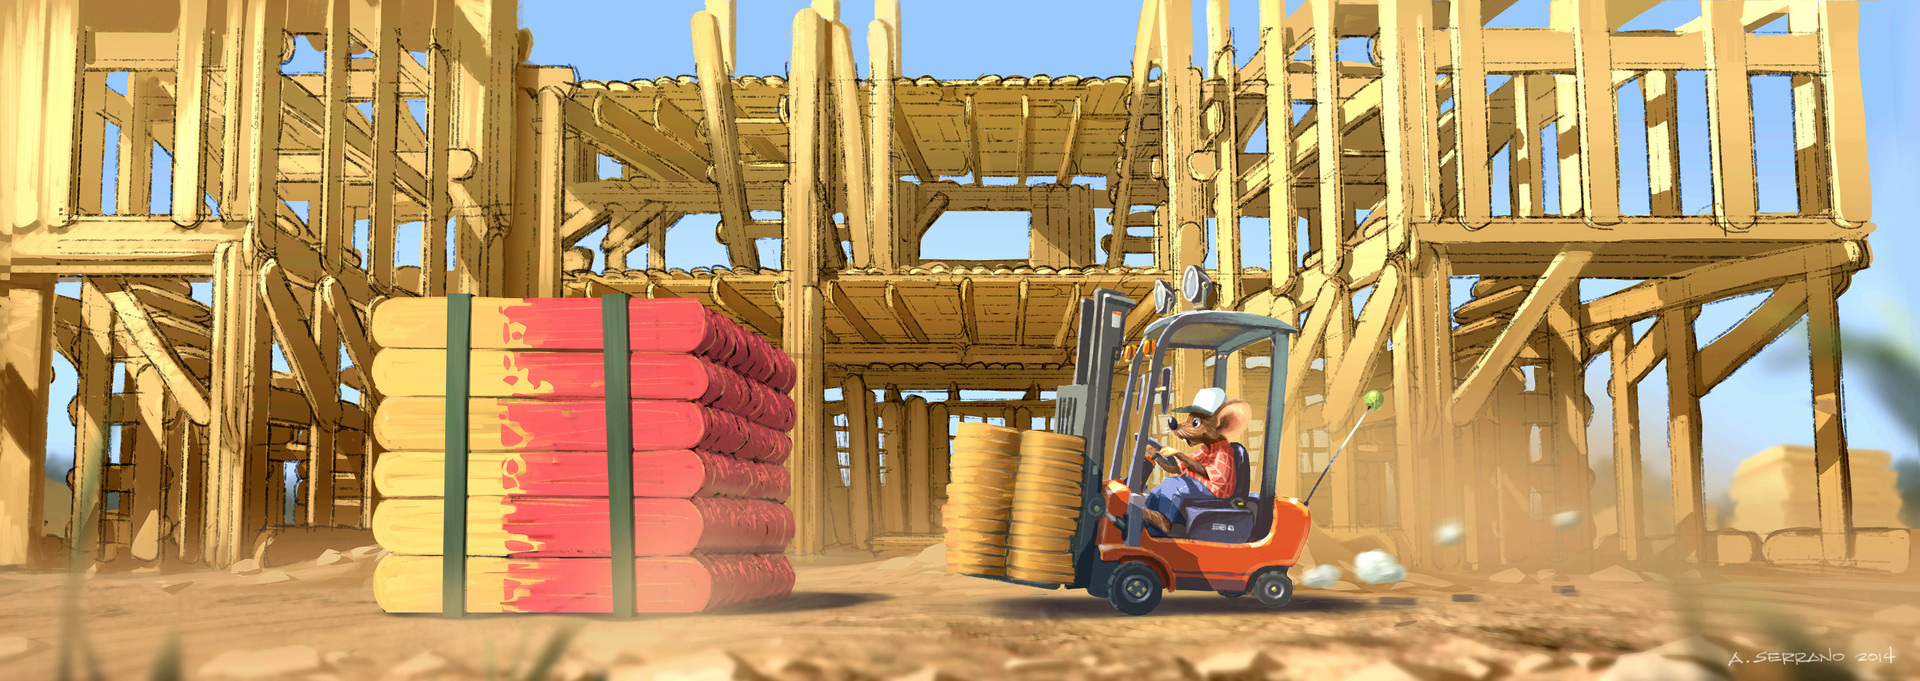 Popsicle Building Site